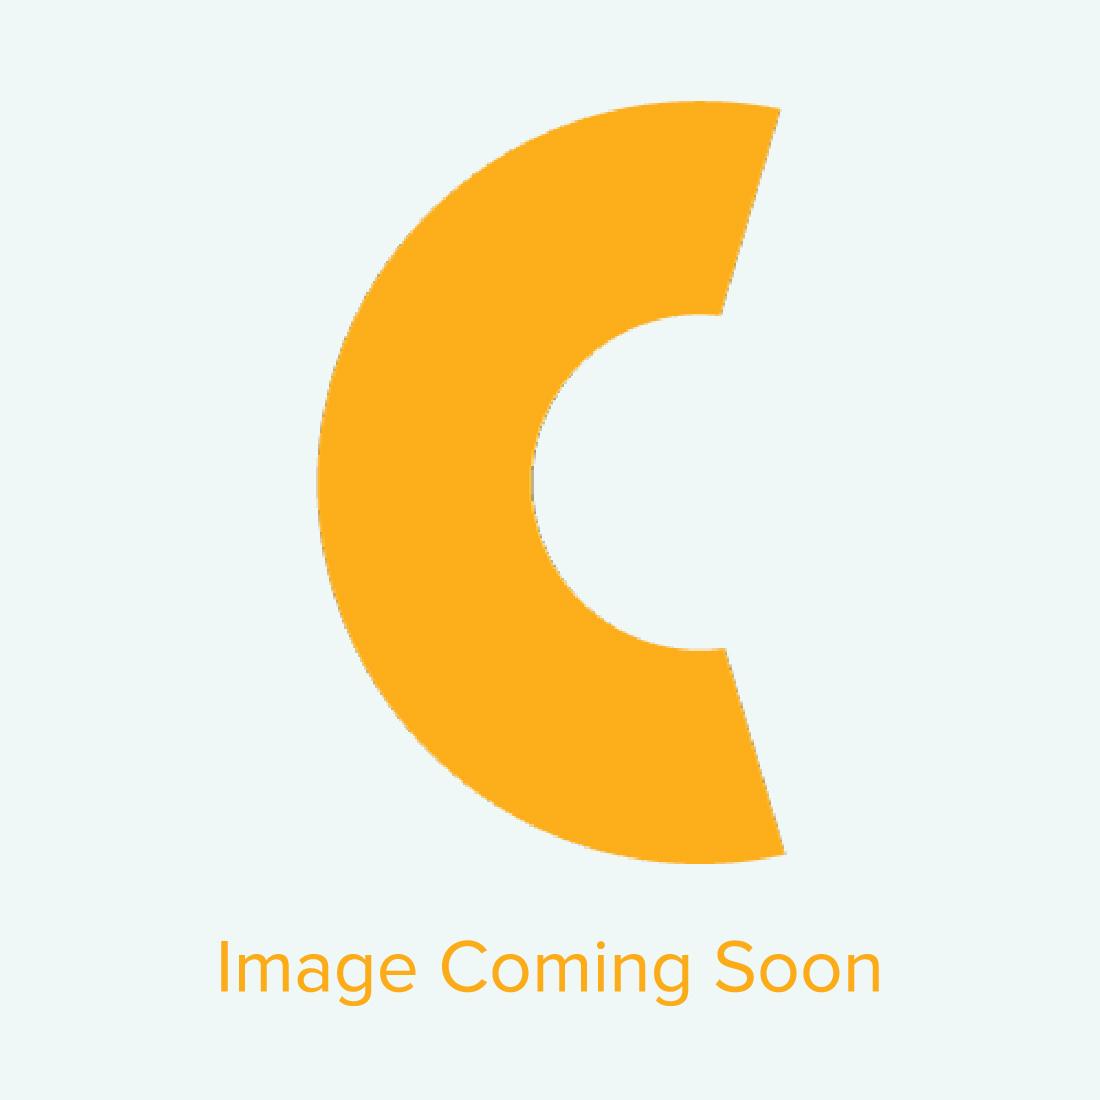 "MDF Hardboard Sublimation Plaque - Flat Profile w/ Black Edge - 8"" x 10"""